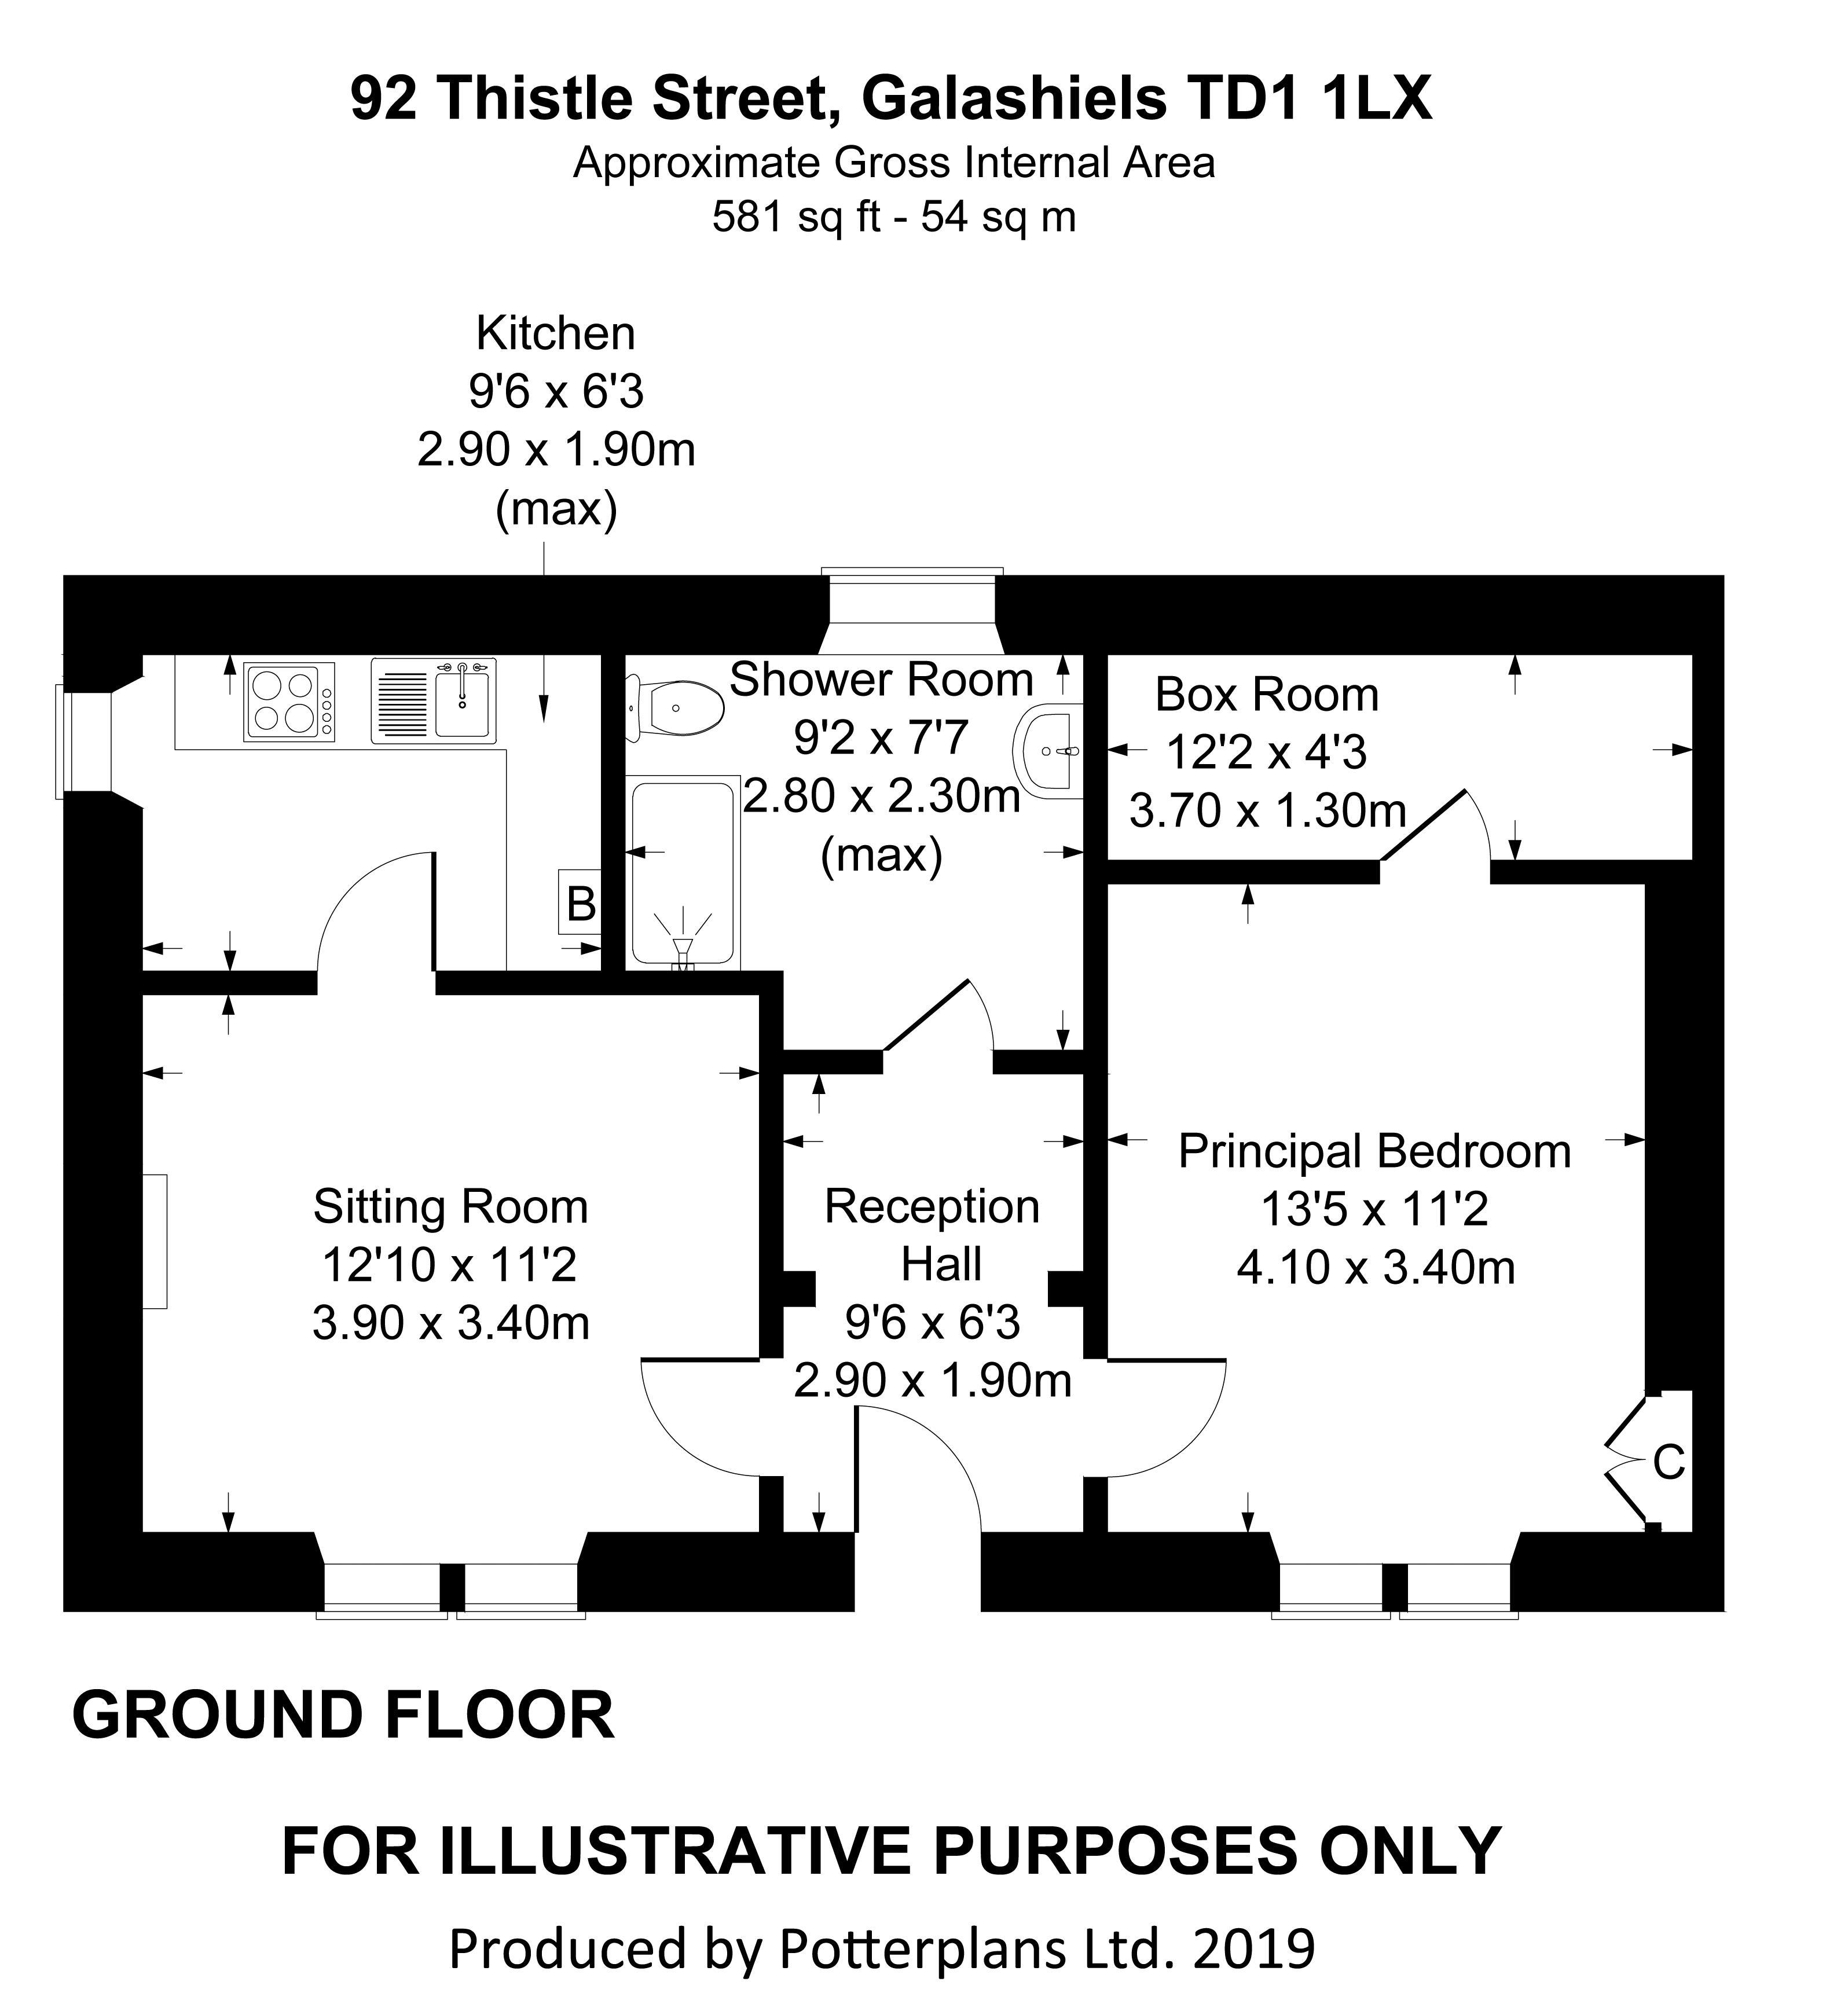 92 Thistle Street Ground Floor